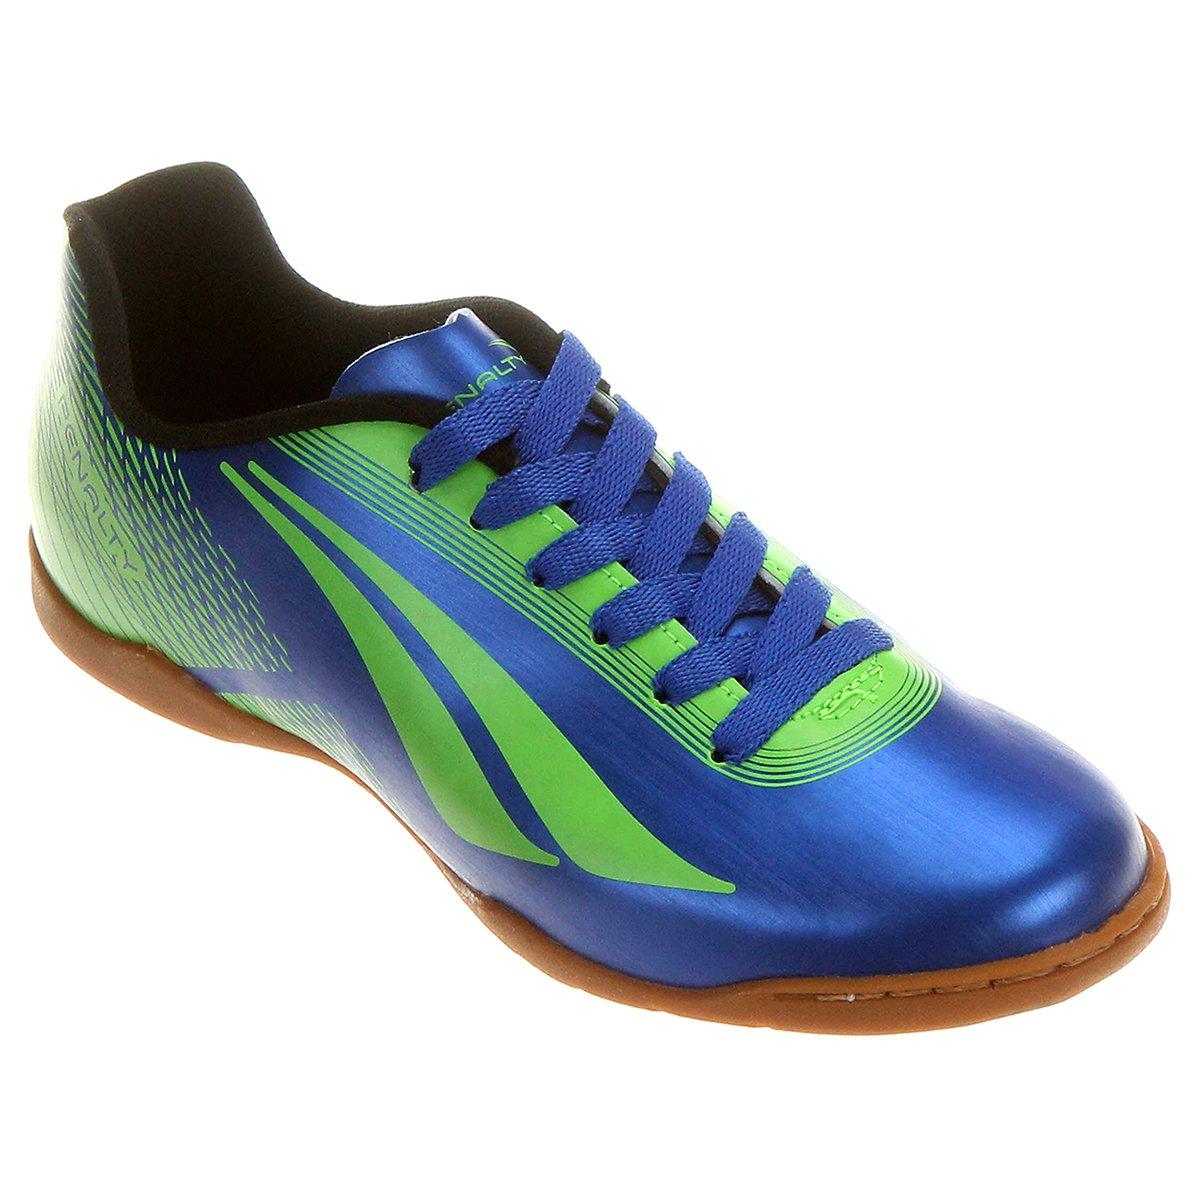 Chuteira Penalty K Soccer Victoria R1 5 Futsal Infantil e1e4aceff7eac